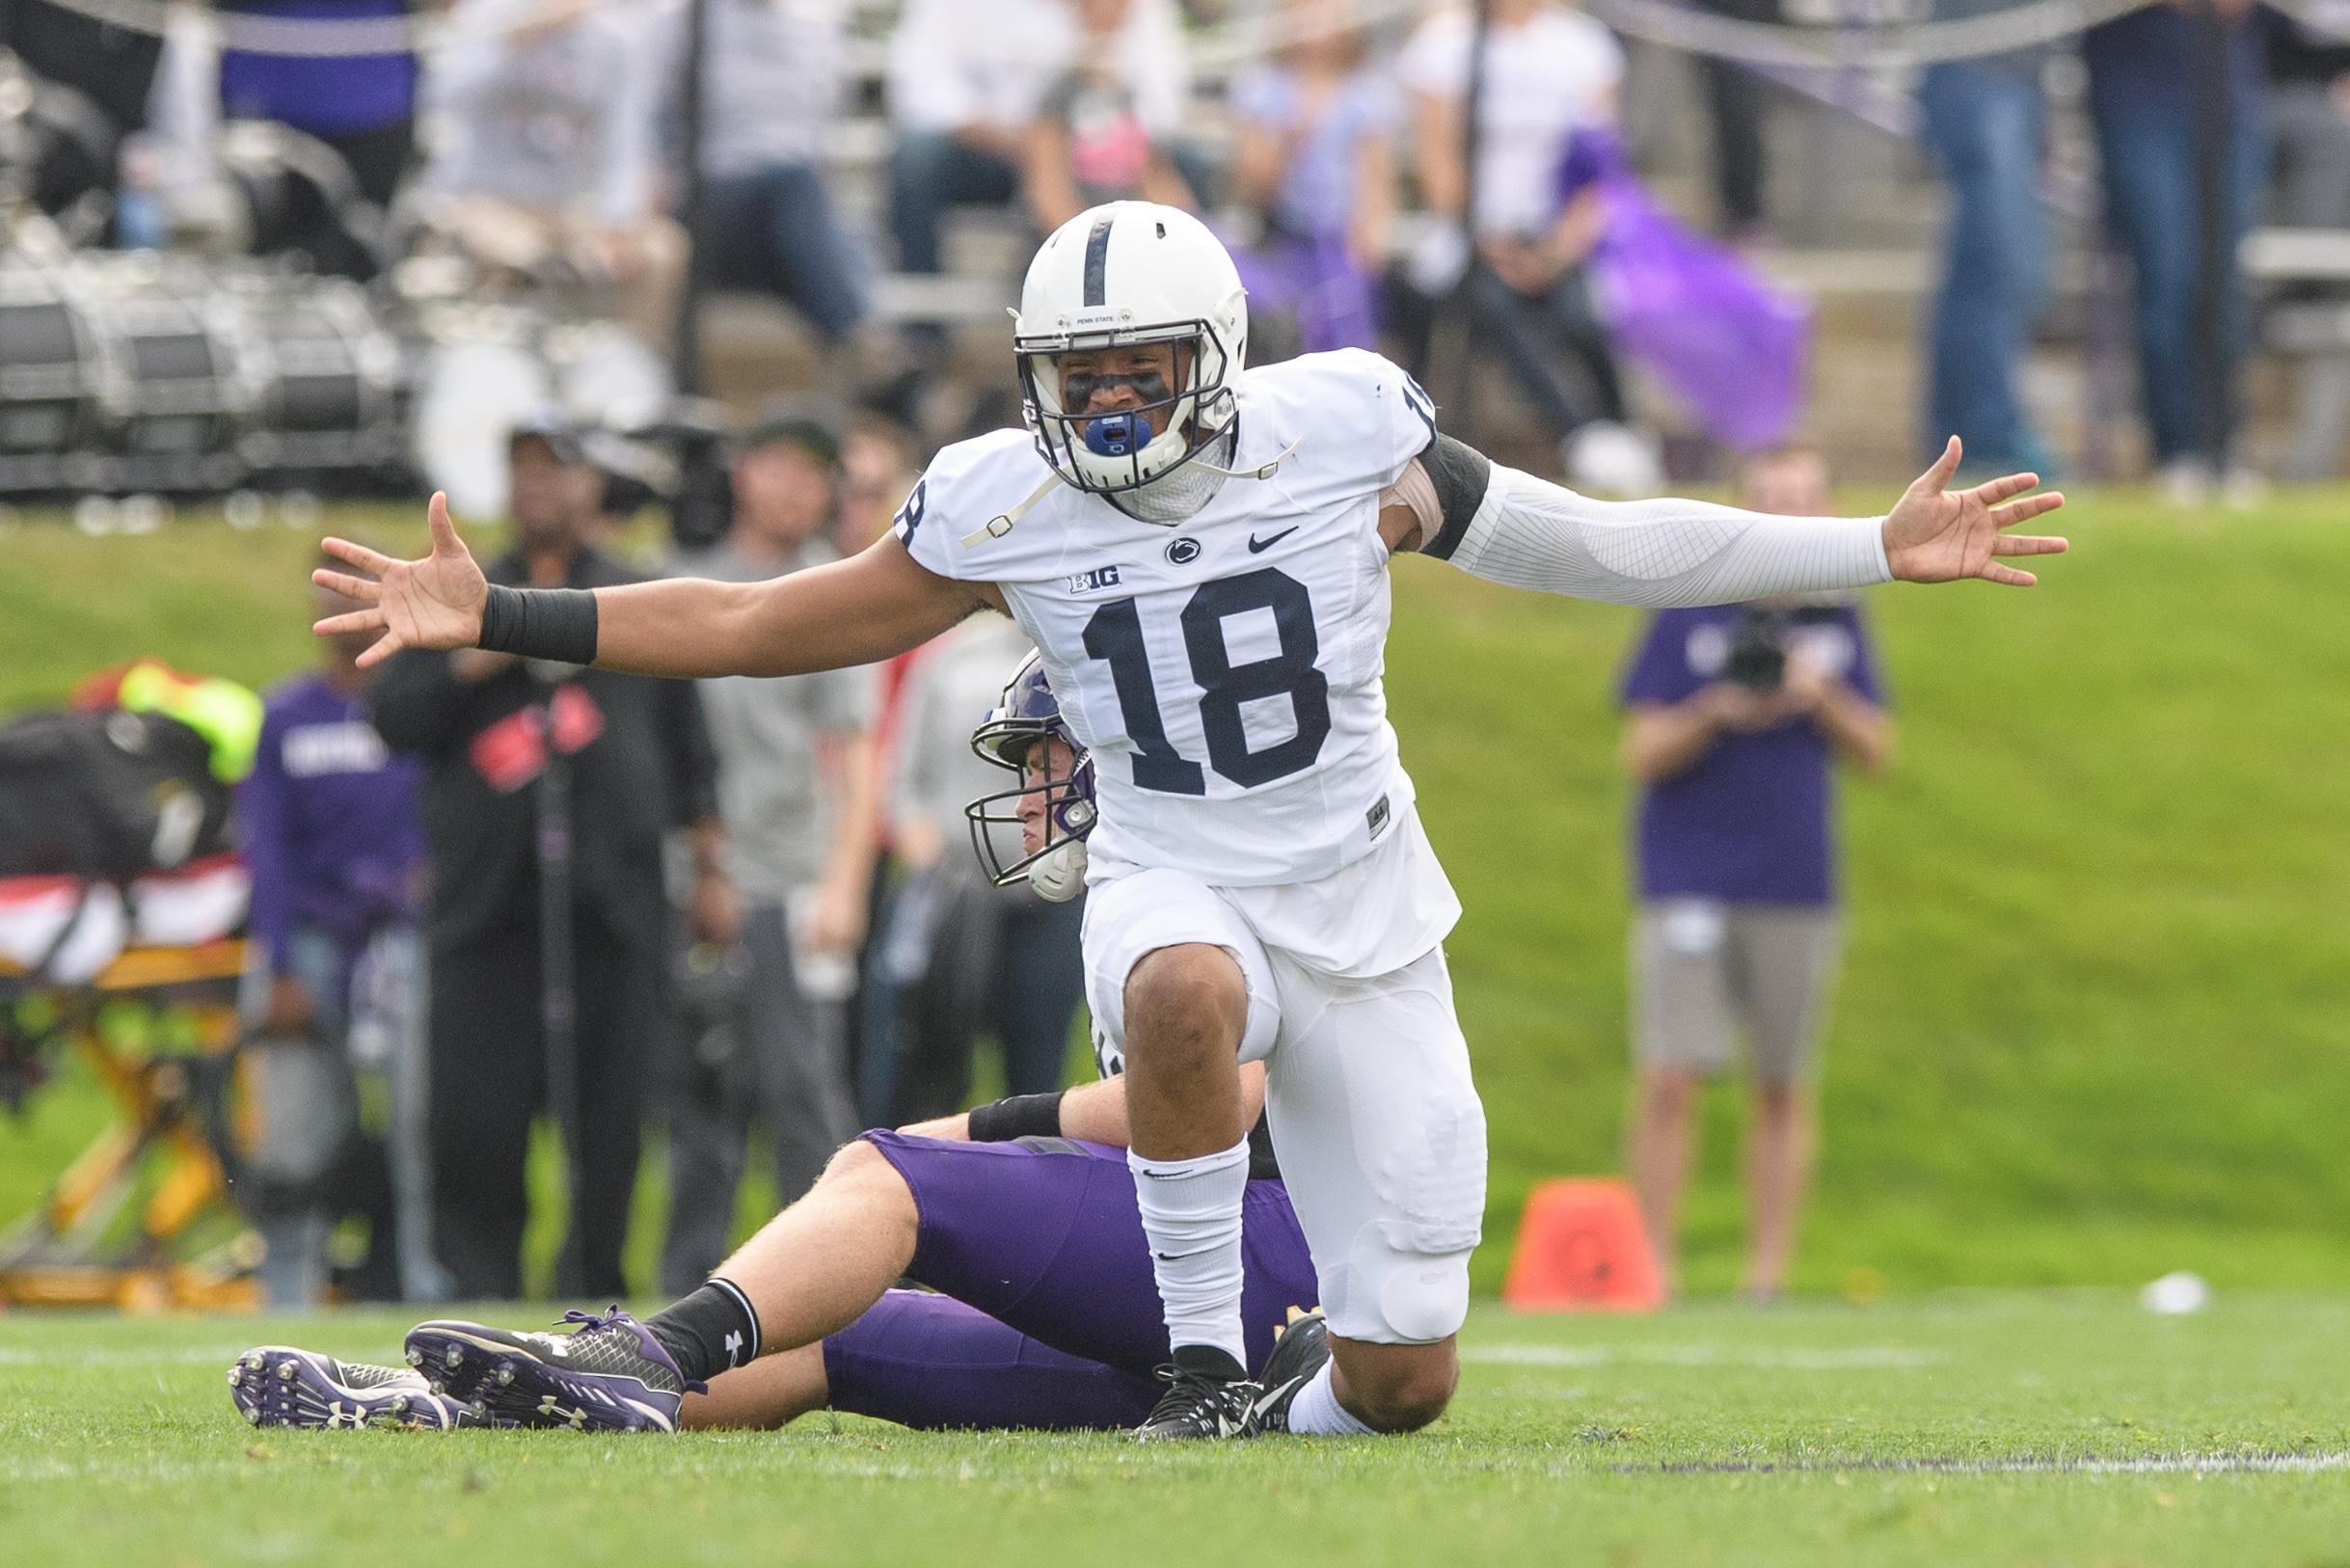 COLLEGE FOOTBALL: OCT 07 Penn State at Northwestern